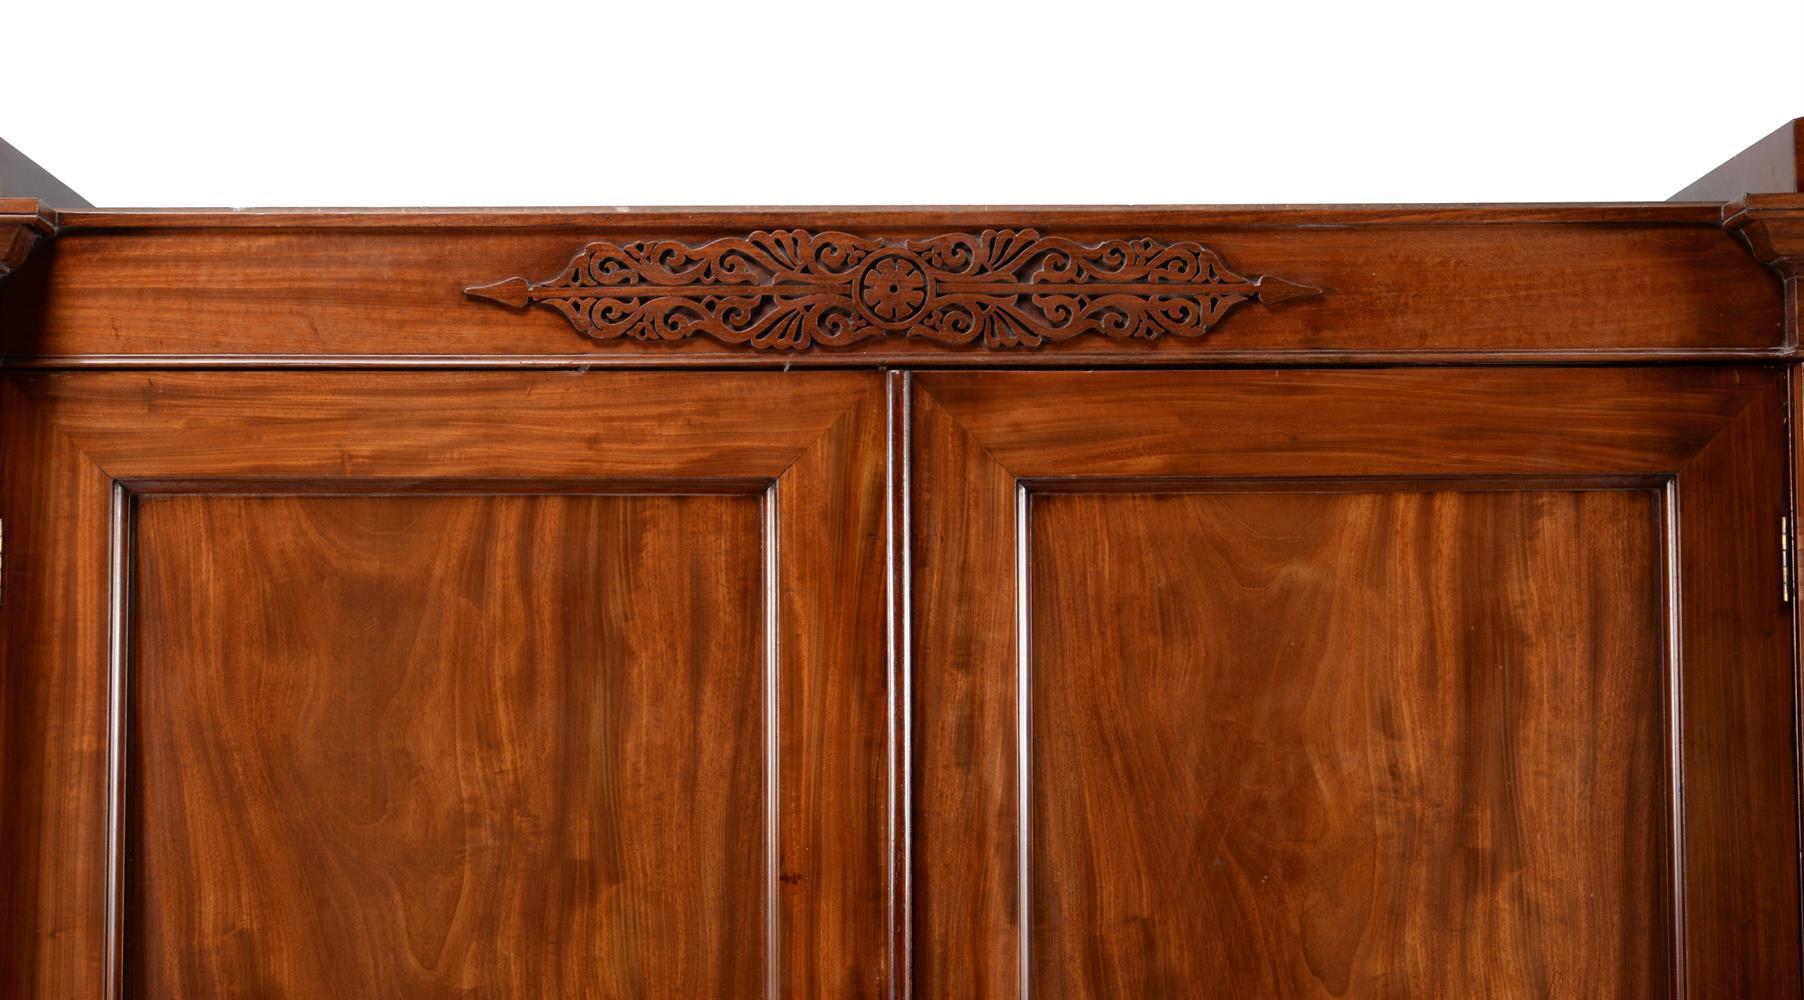 A William IV mahogany compactum wardrobe - Image 2 of 3